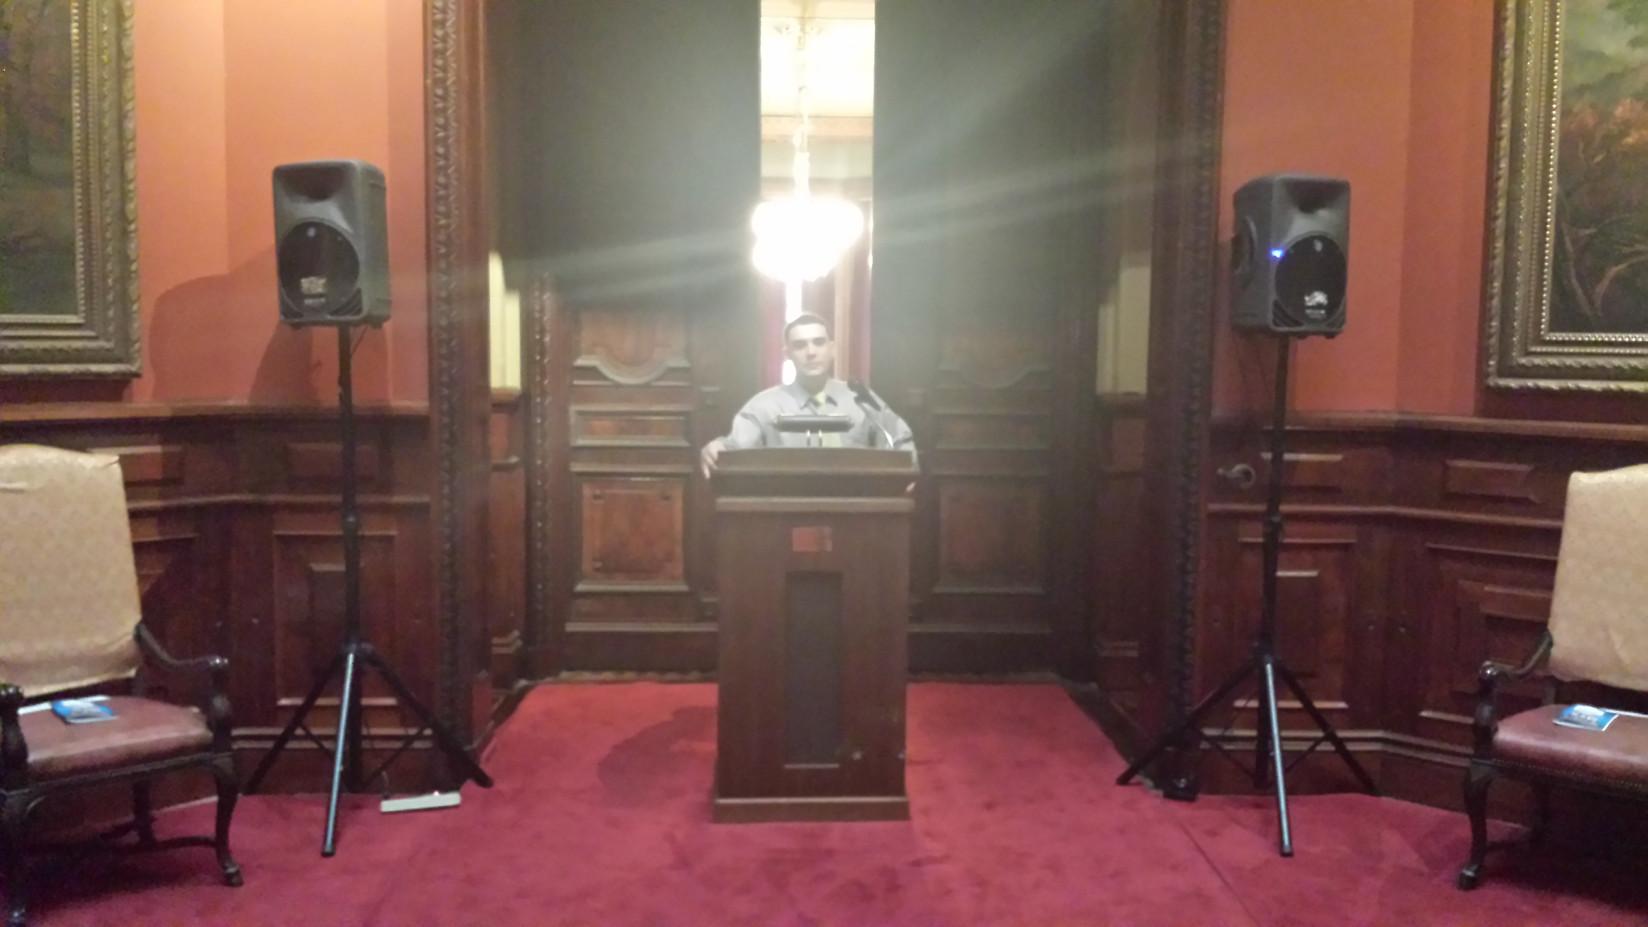 Speaker-On-Stand-For-Event.jpg